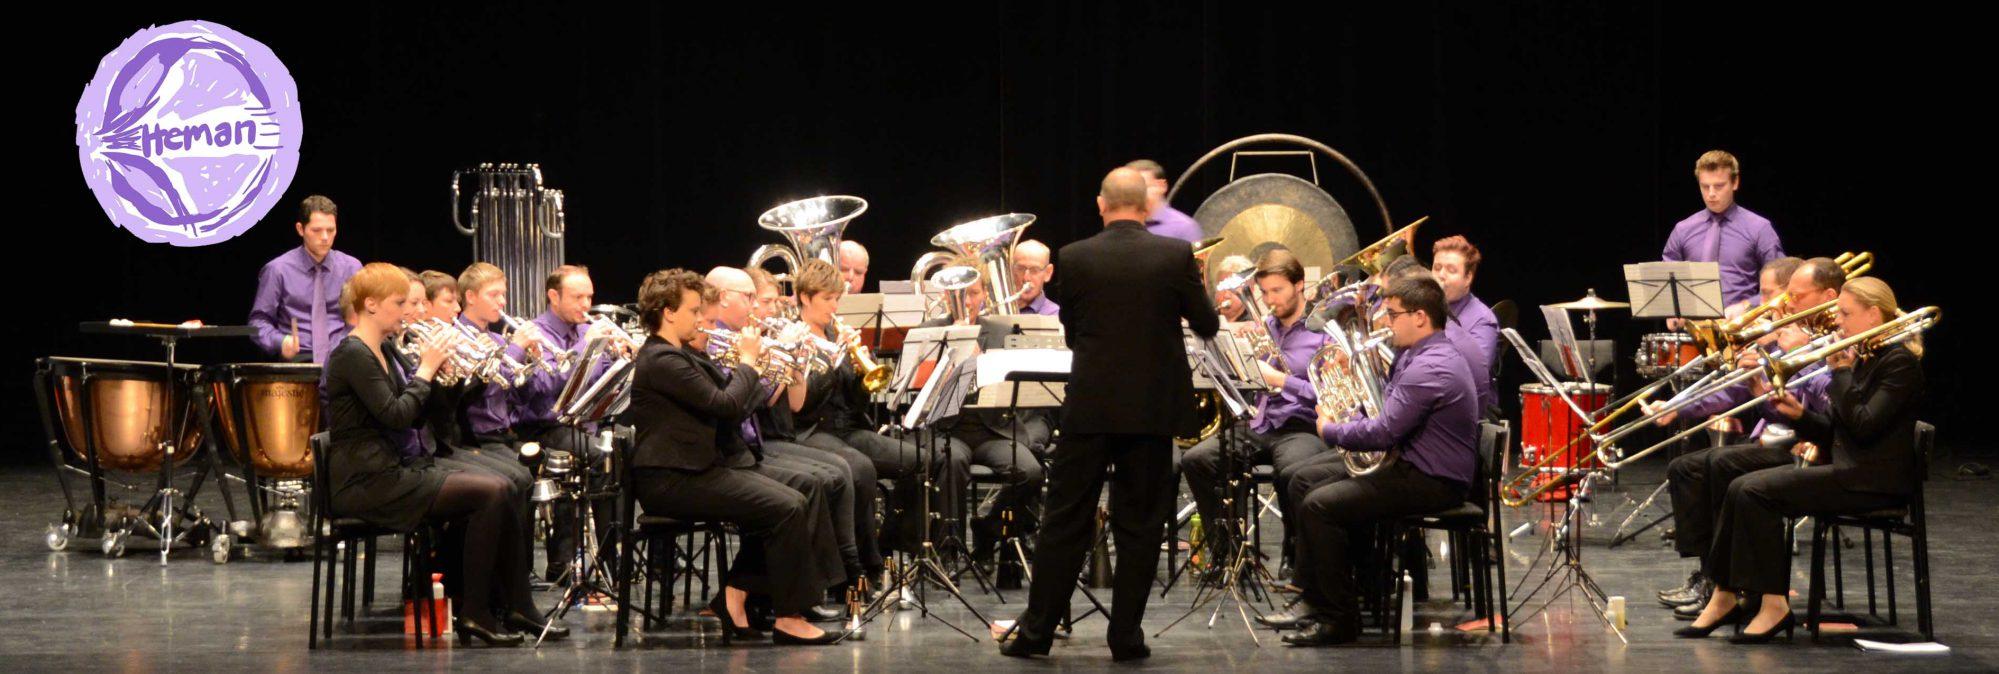 Brassband Heman Zuidwolde